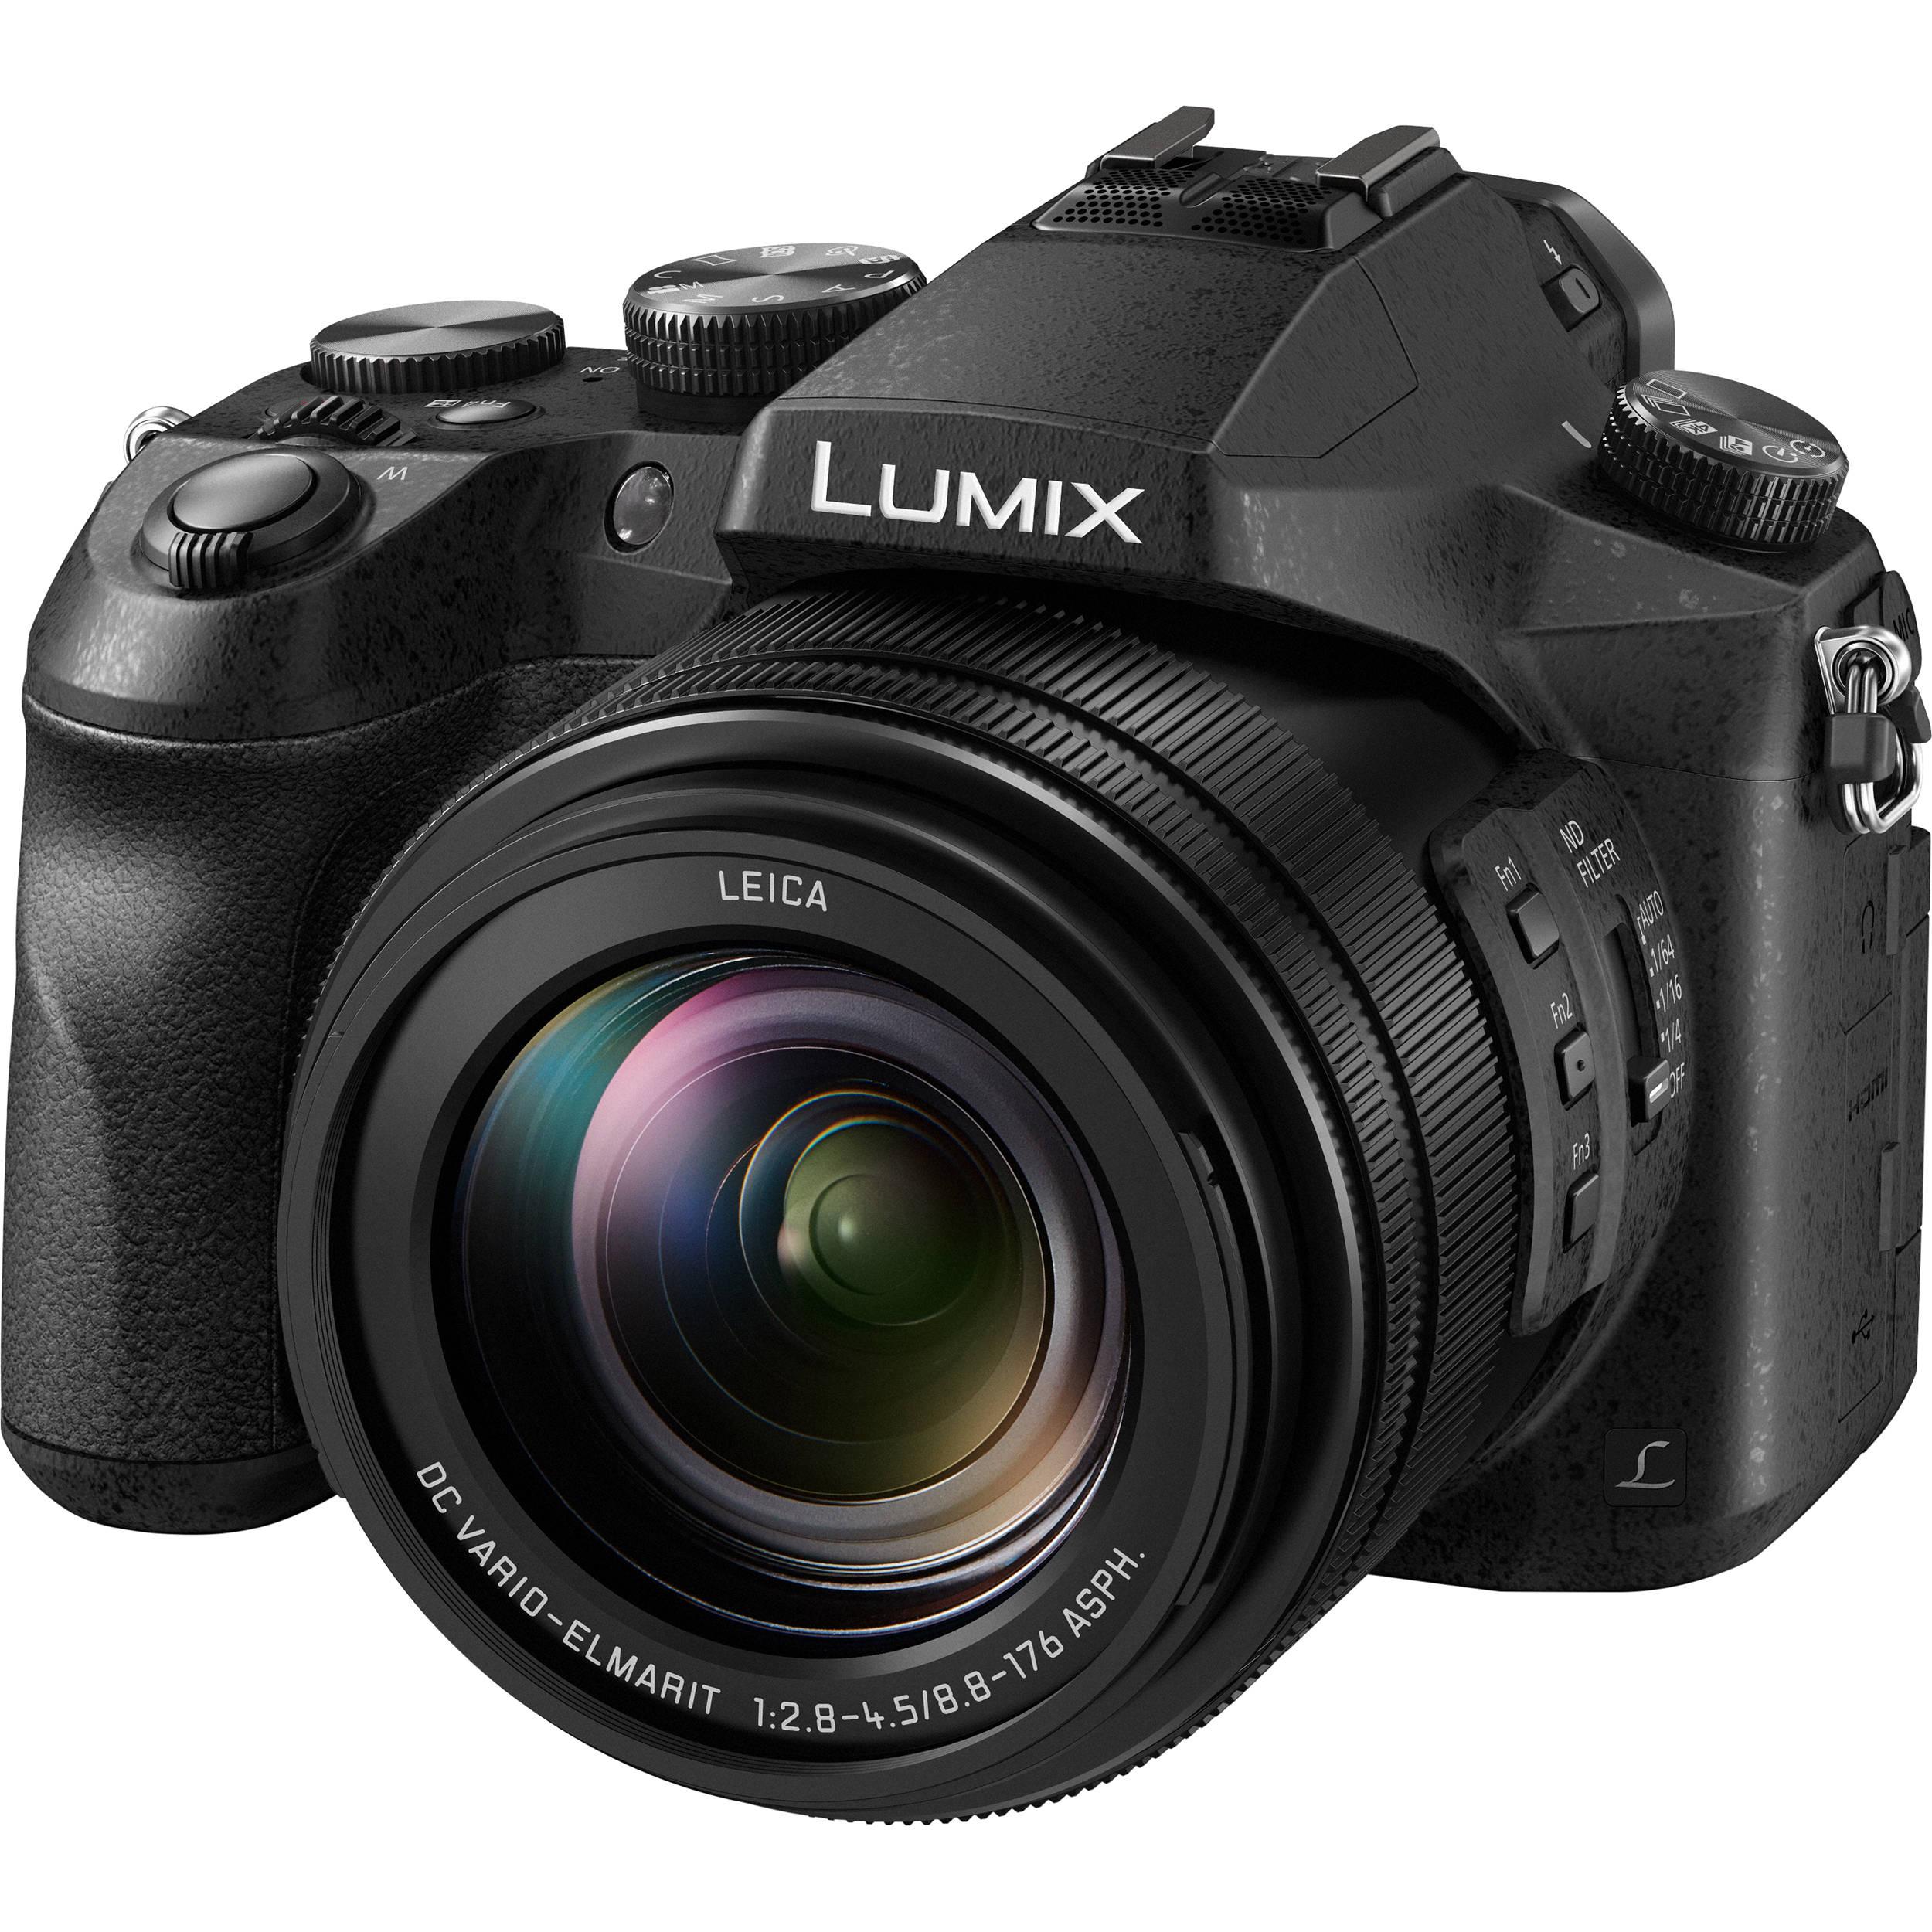 Panasonic Lumix DMC-FZ2500 Digital Camera DMC-FZ2500 B&H Photo